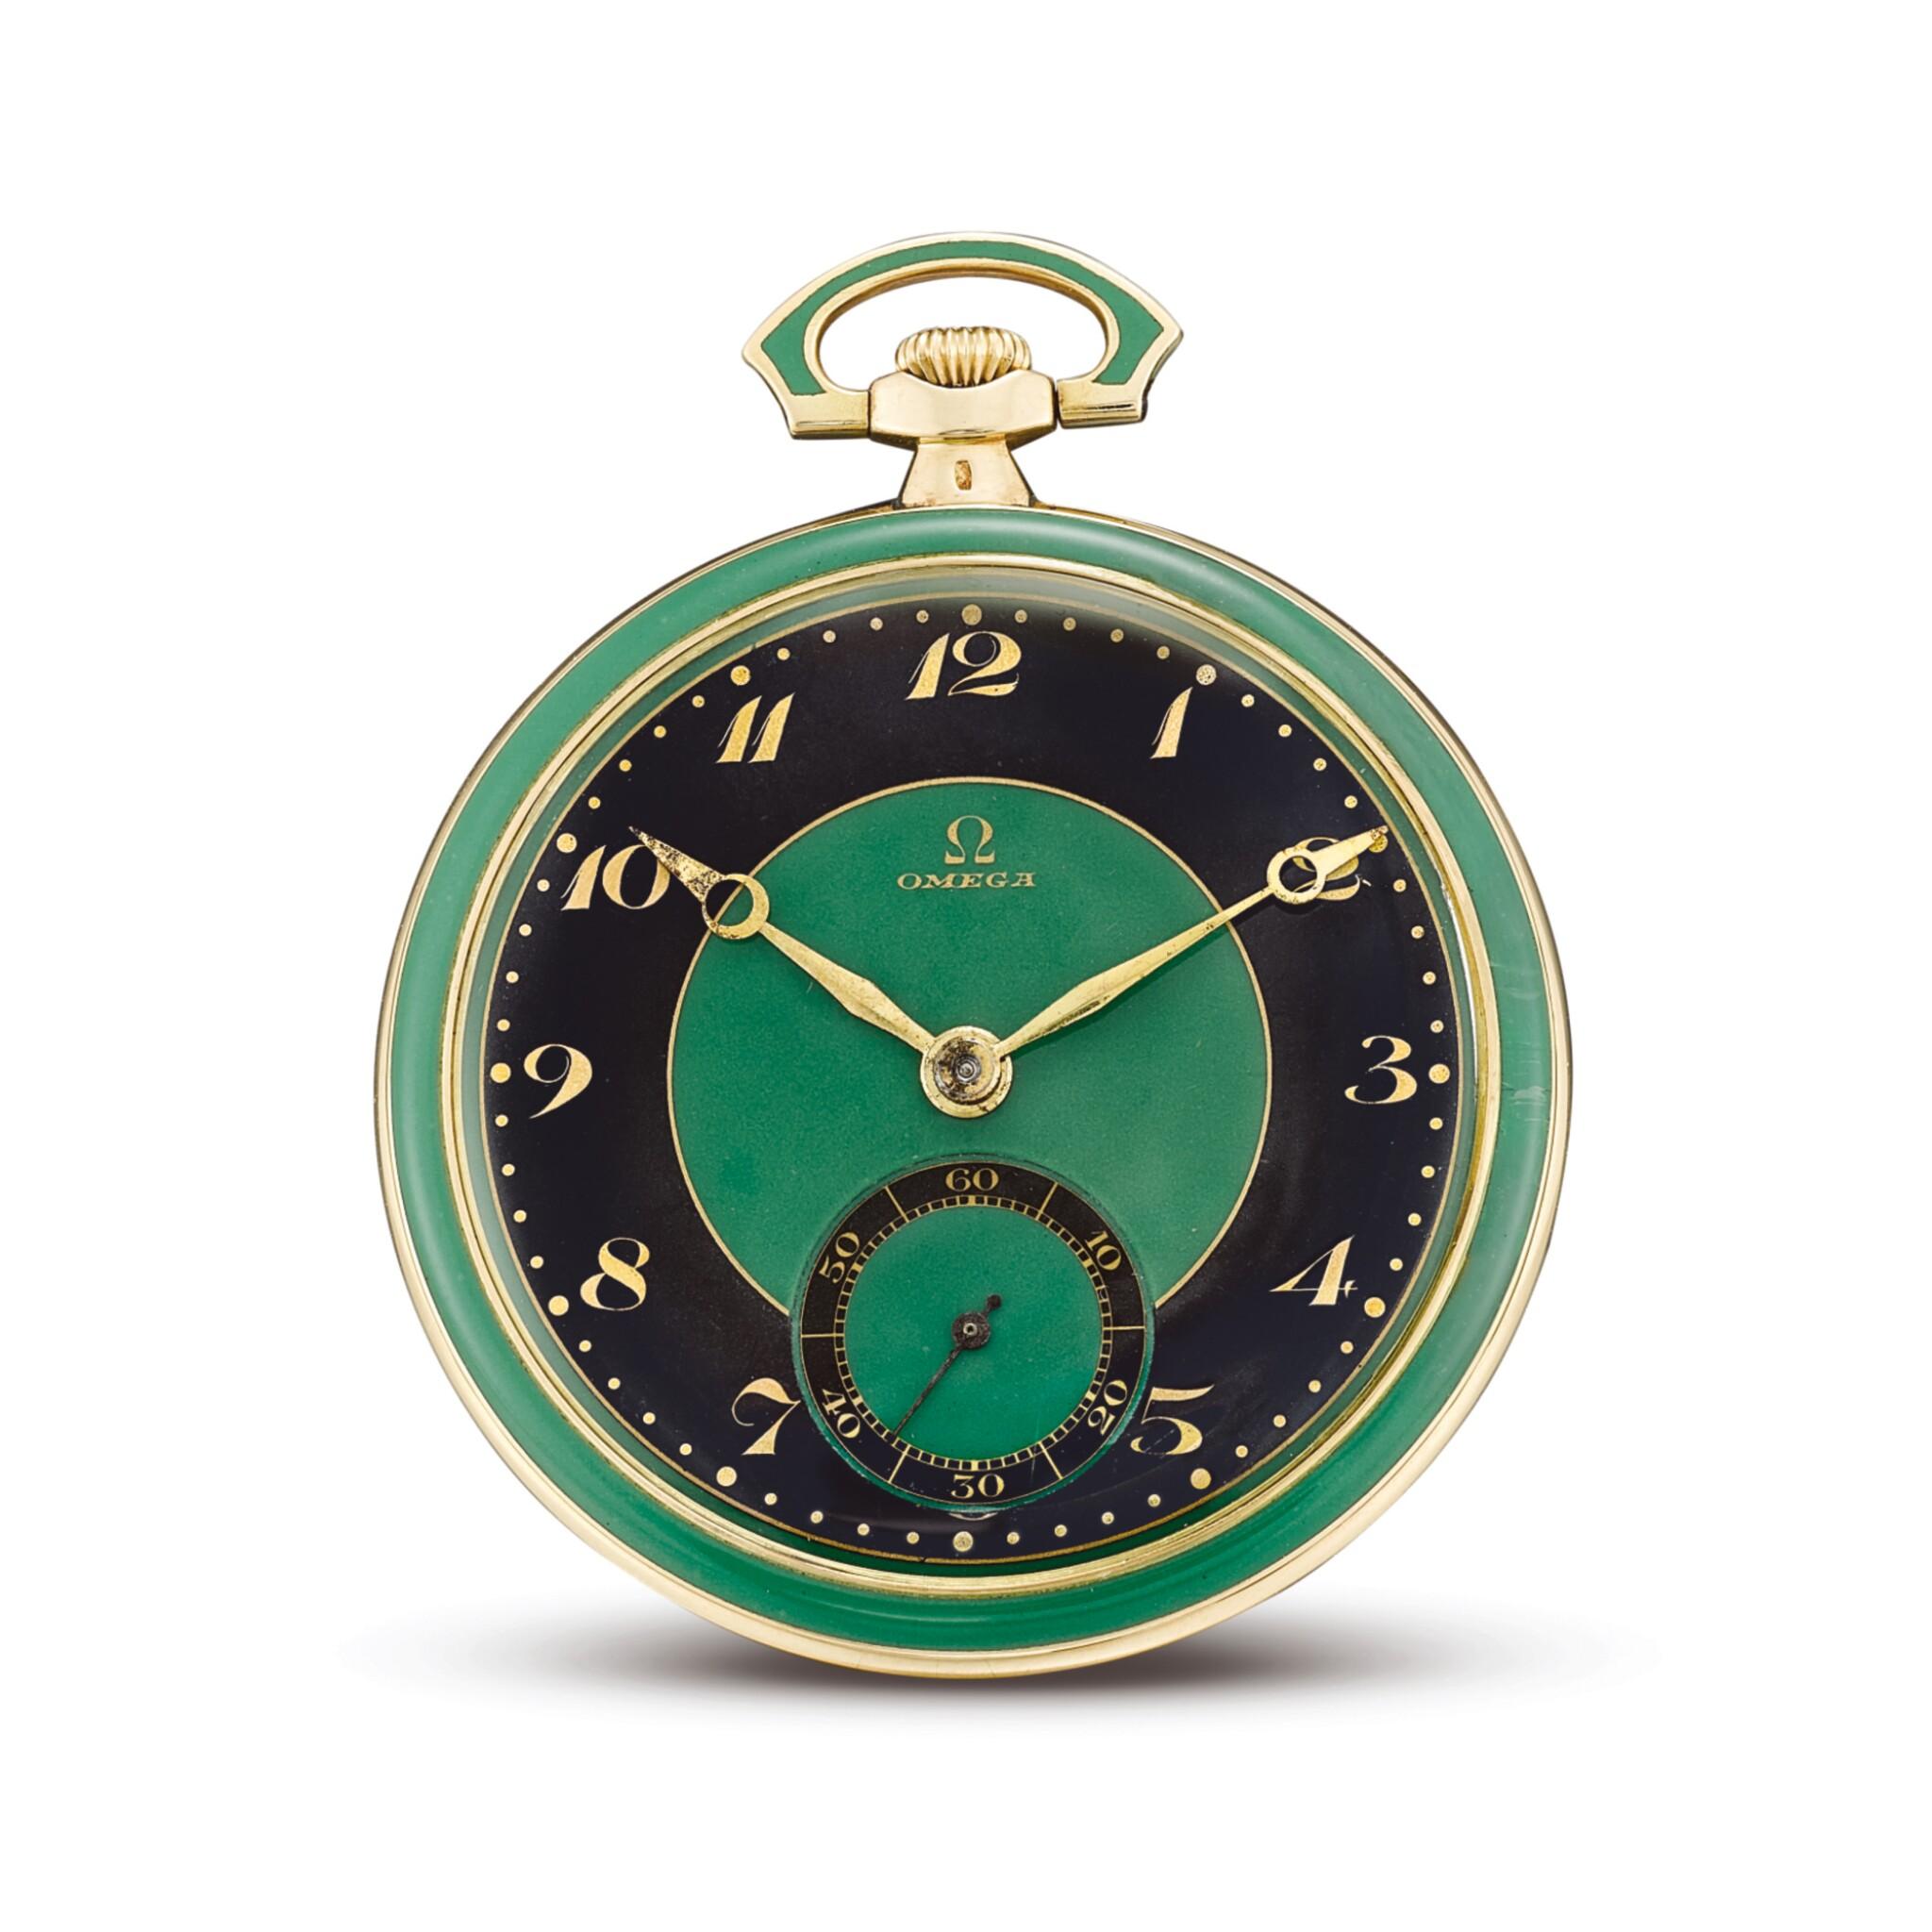 View full screen - View 1 of Lot 2268. OMEGA | A YELLOW GOLD, BLACK AND GREEN ENAMEL OPENFACE WATCH, CIRCA 1920  | 奧米茄 | 黃金黑色及綠色琺瑯懷錶,機芯編號6337800,錶殼編號6919752,約1920年製.